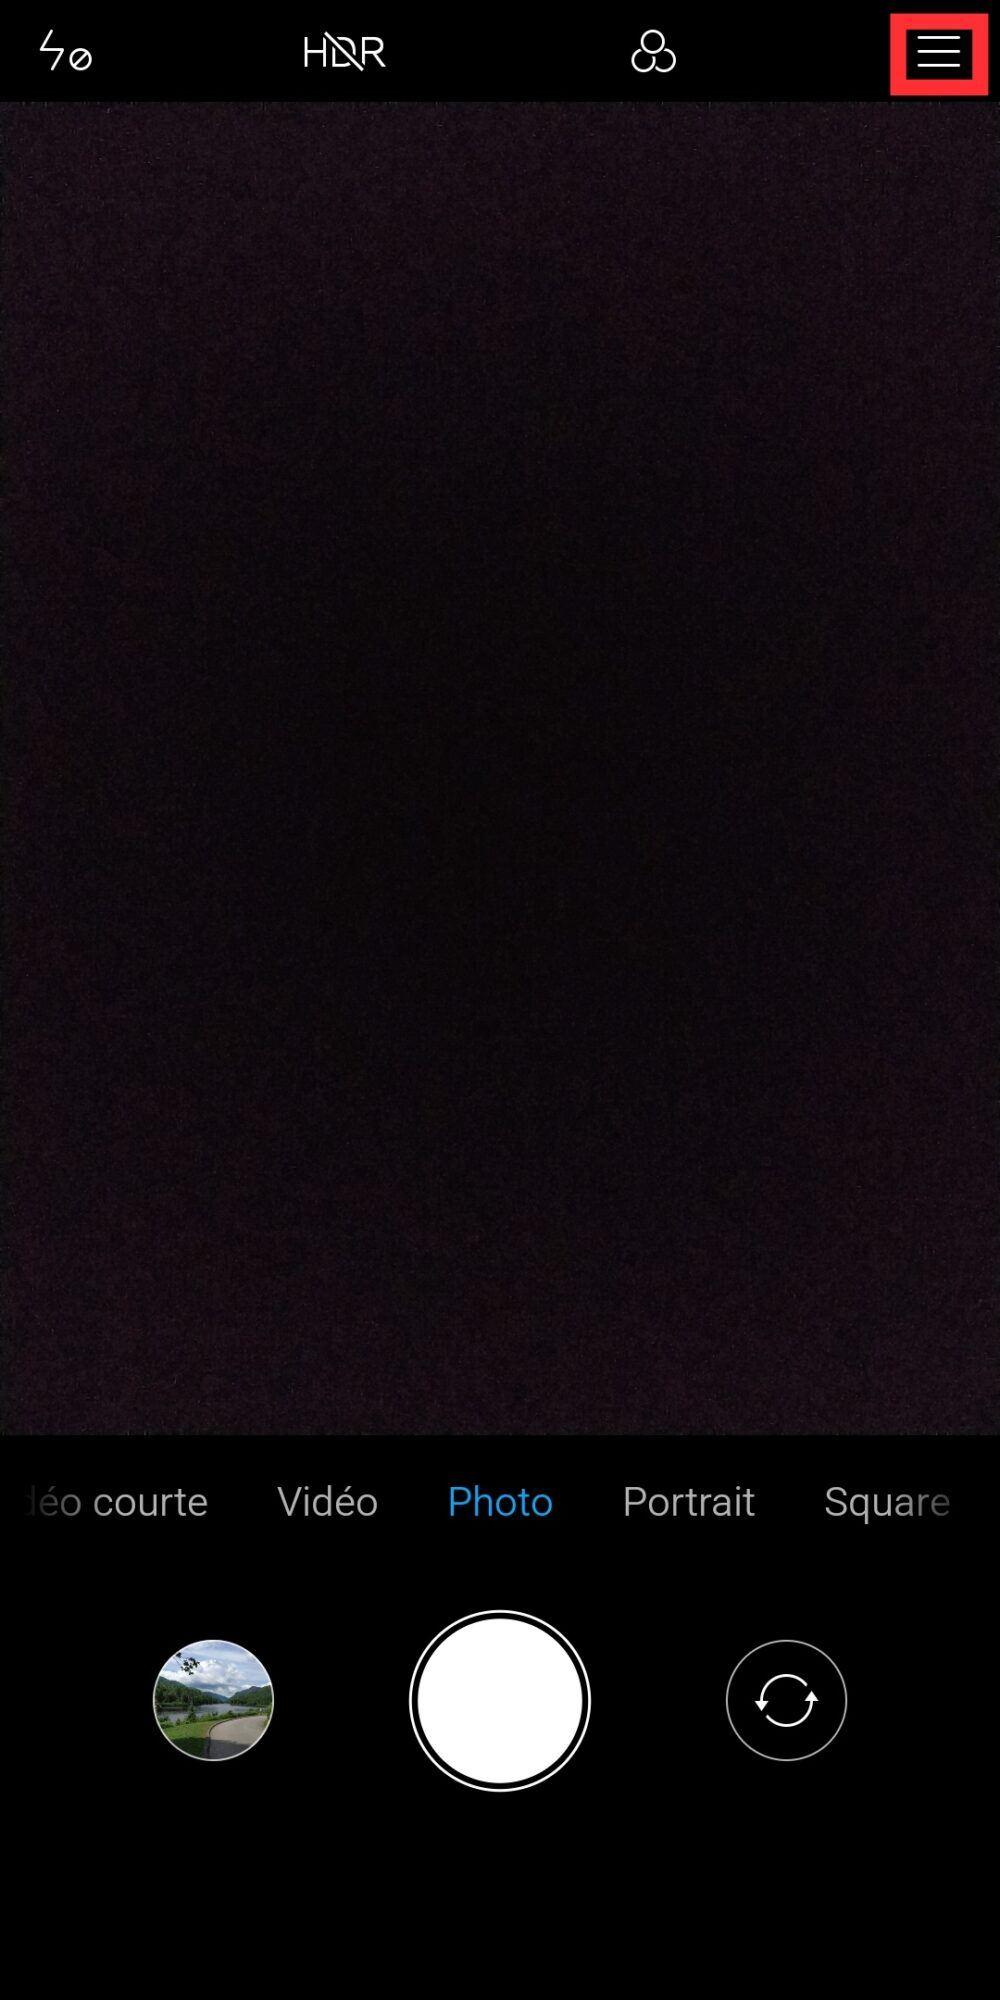 parametres-appareil-photo-smartphone-xiaomi